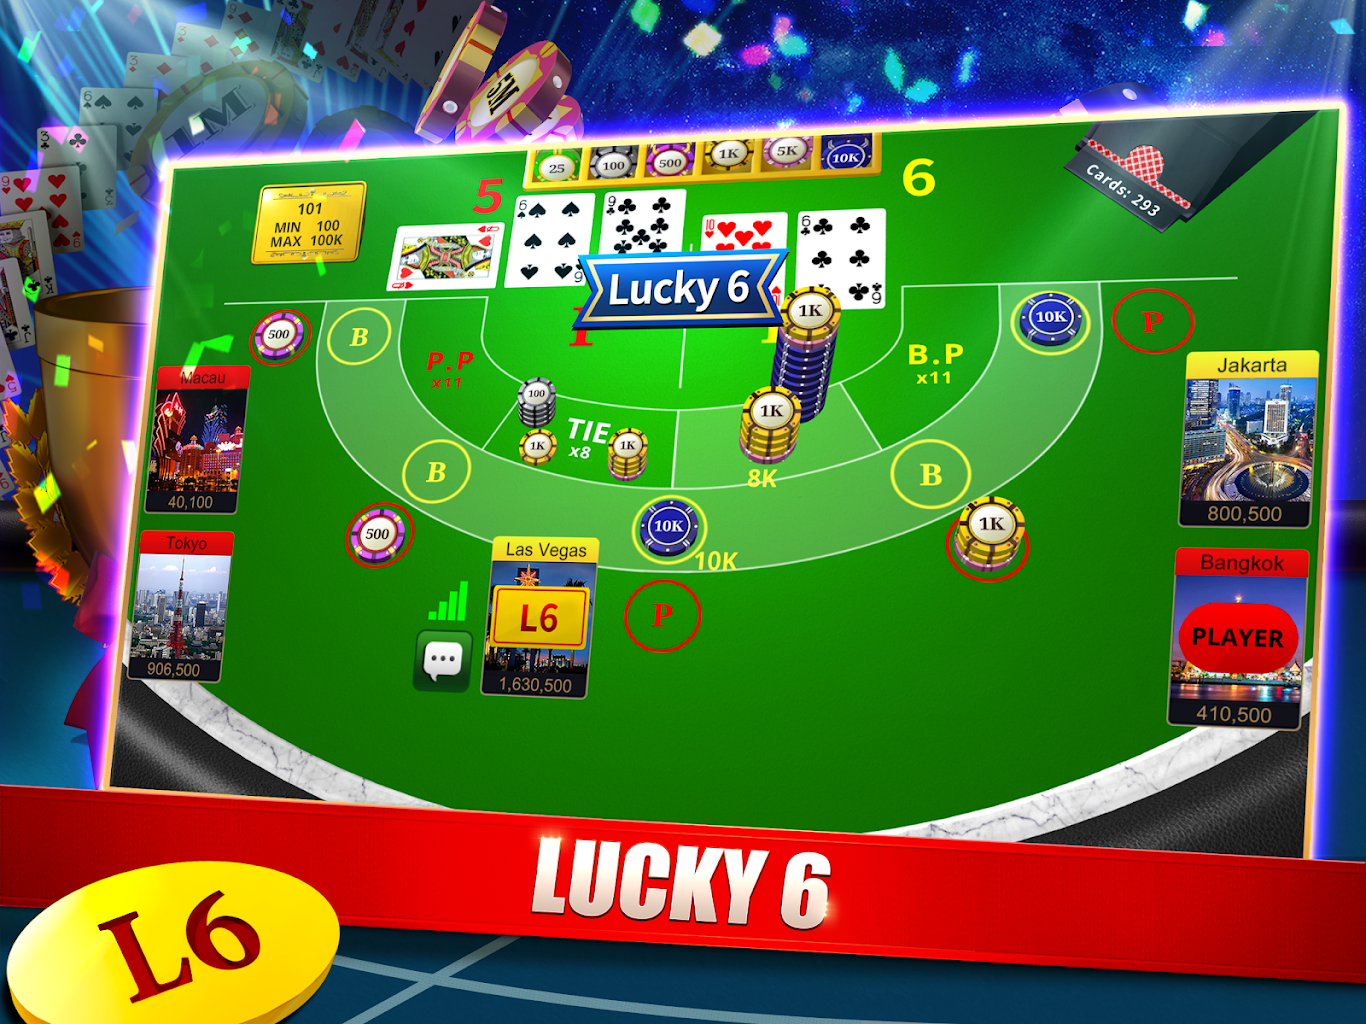 Dragon Ace Casino Baccarat 3 15 0 Apk Download Com Gamespring Dac Apk Free